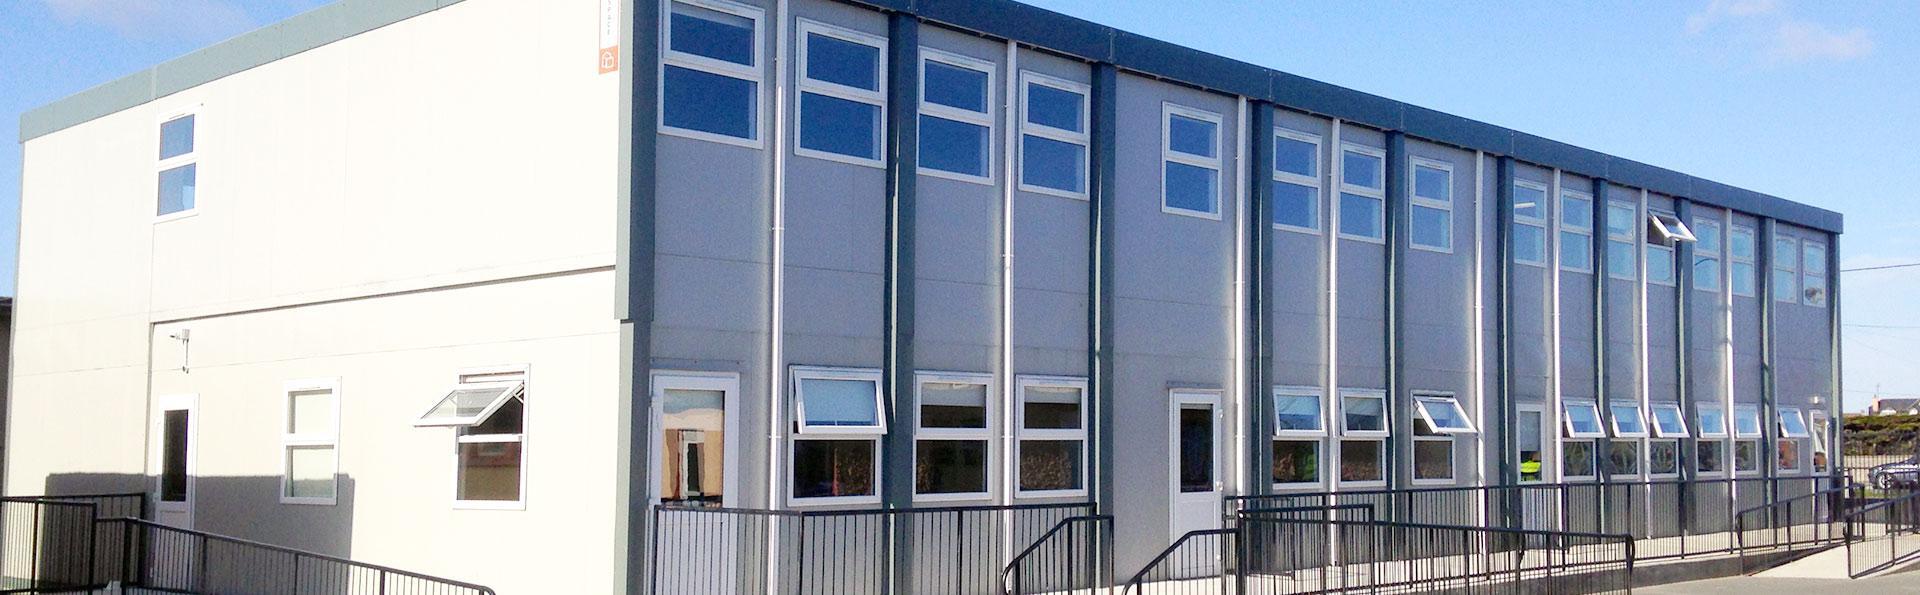 Instaspace provided a solution for St. Joseph's Secondary School, Dublin